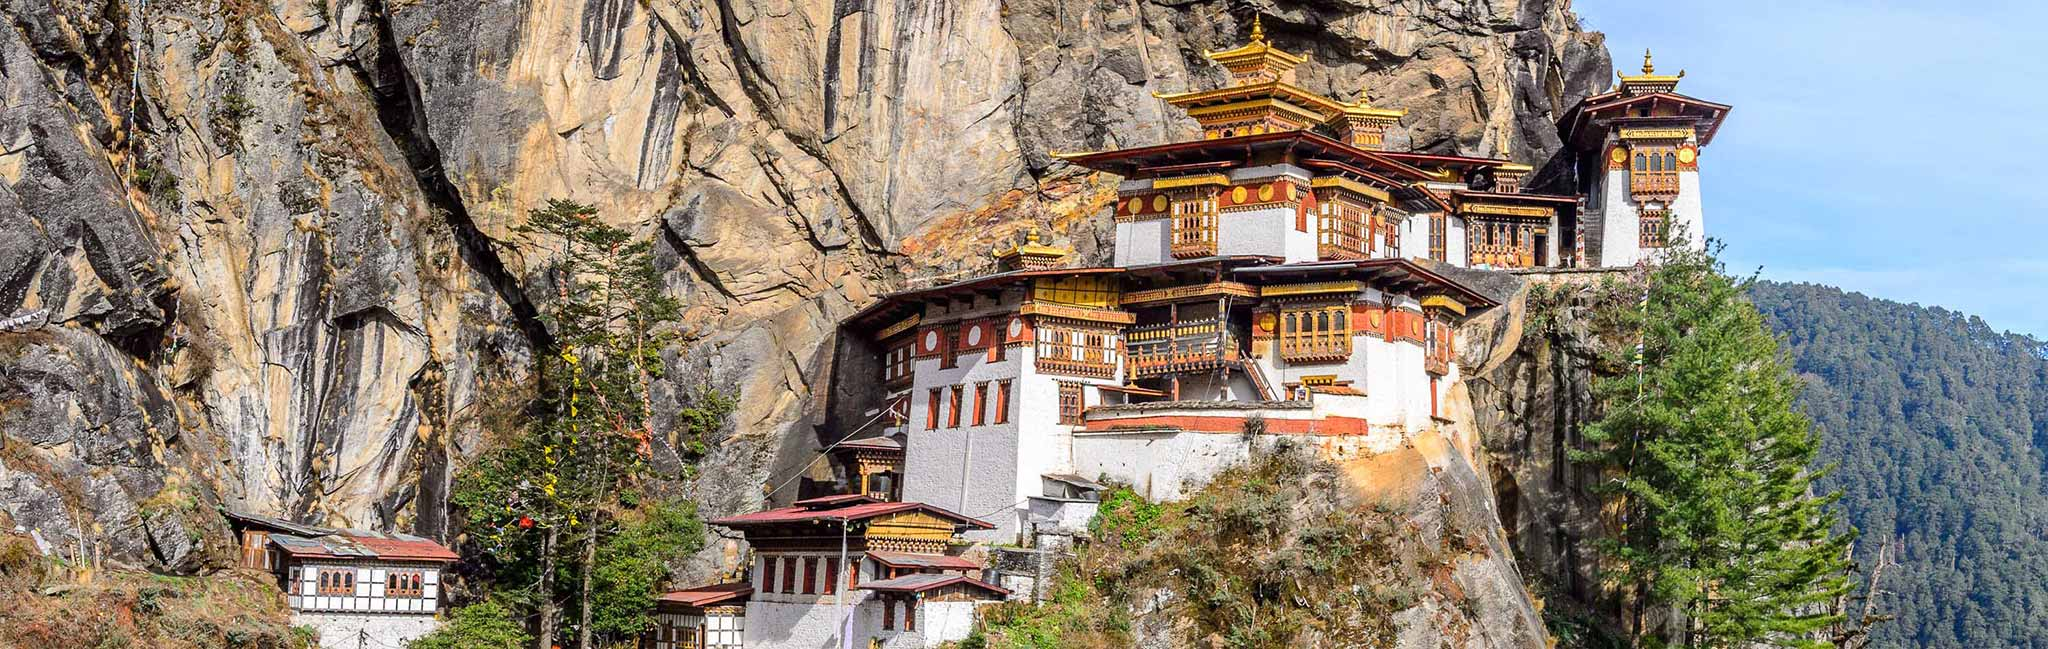 Bhutan Tour of the Paro Valley's Tigers Nest Monastery